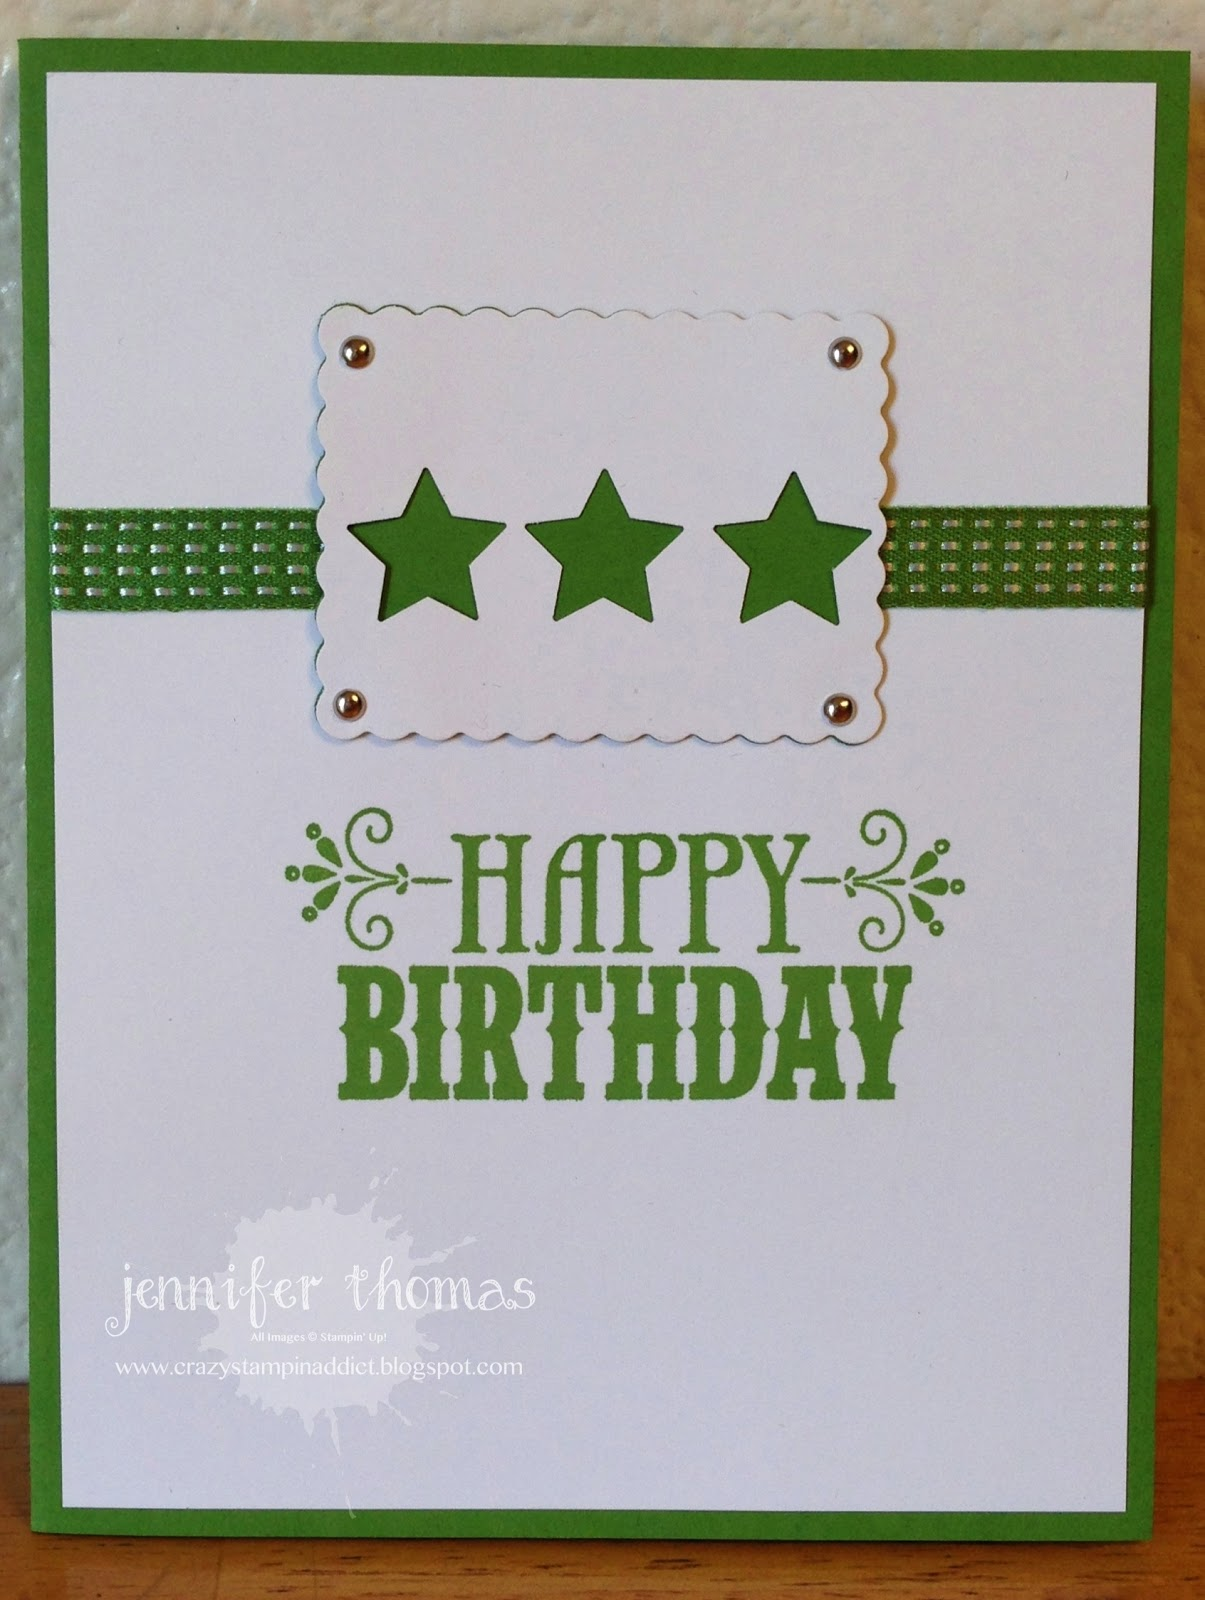 crazystampinaddict simple manly birthday card, Birthday card